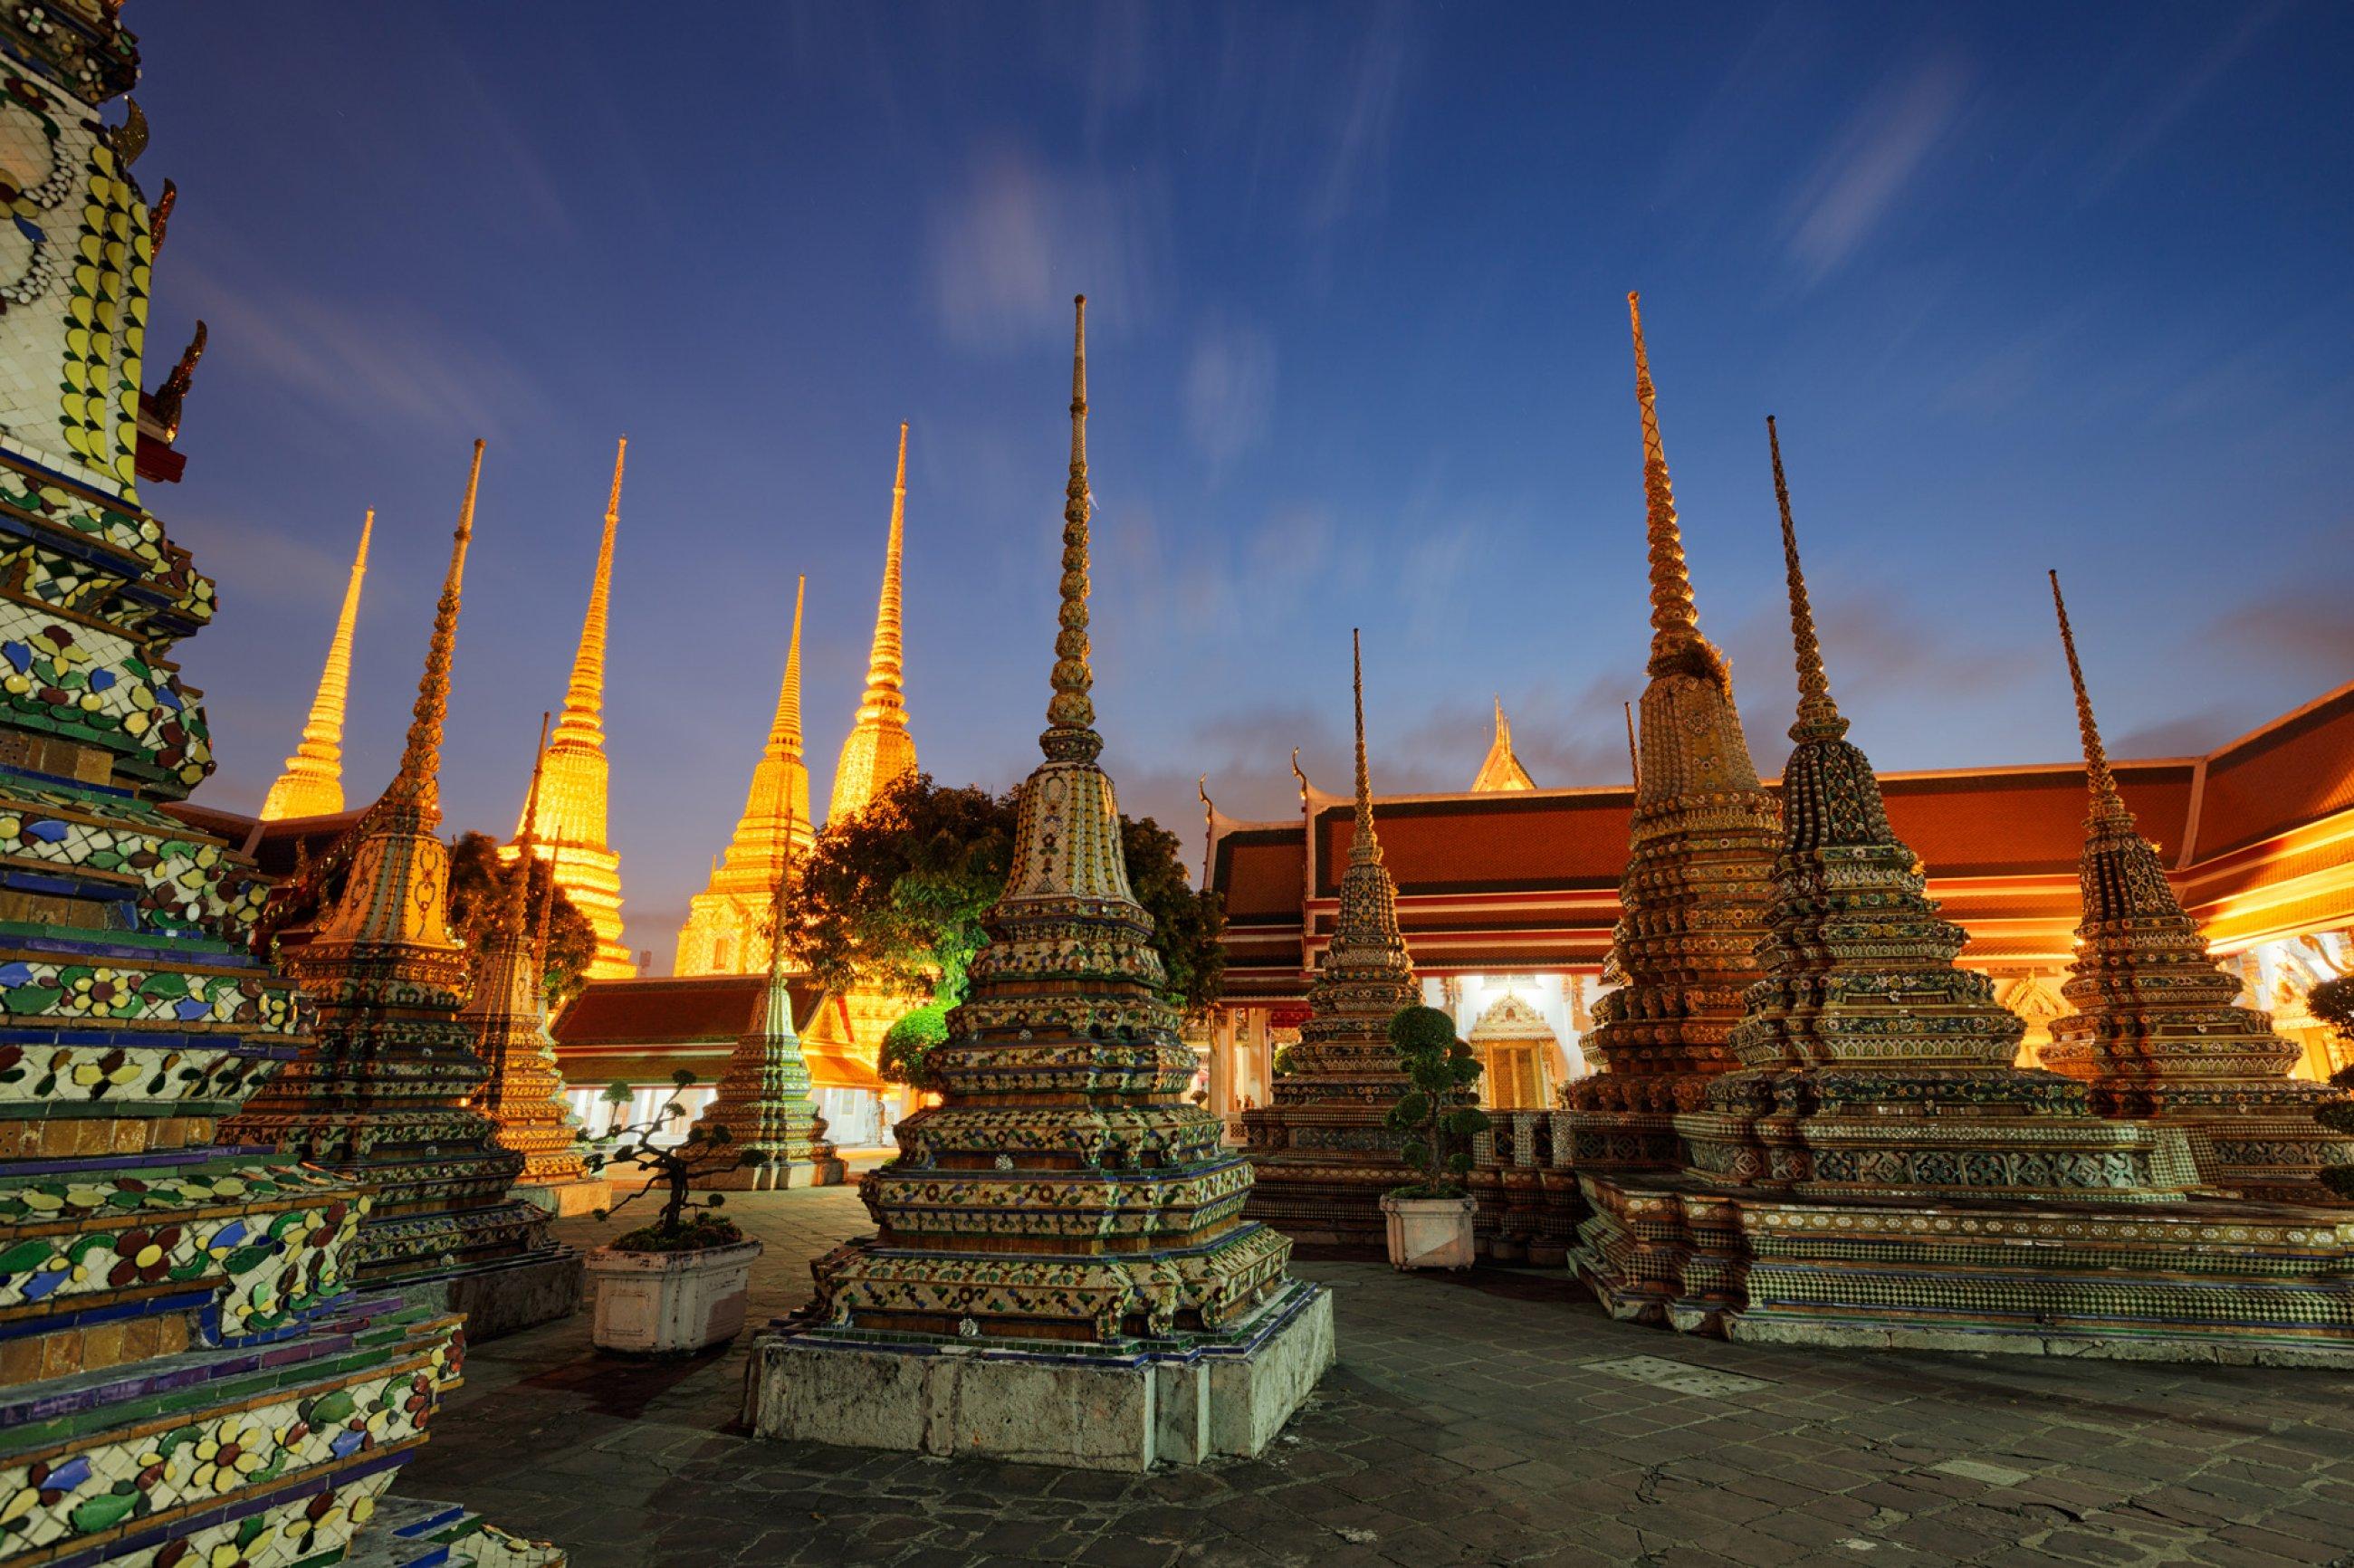 https://bubo.sk/uploads/galleries/7404/bkk-bangkok-dreamstime-xl-42485181-3-.jpg